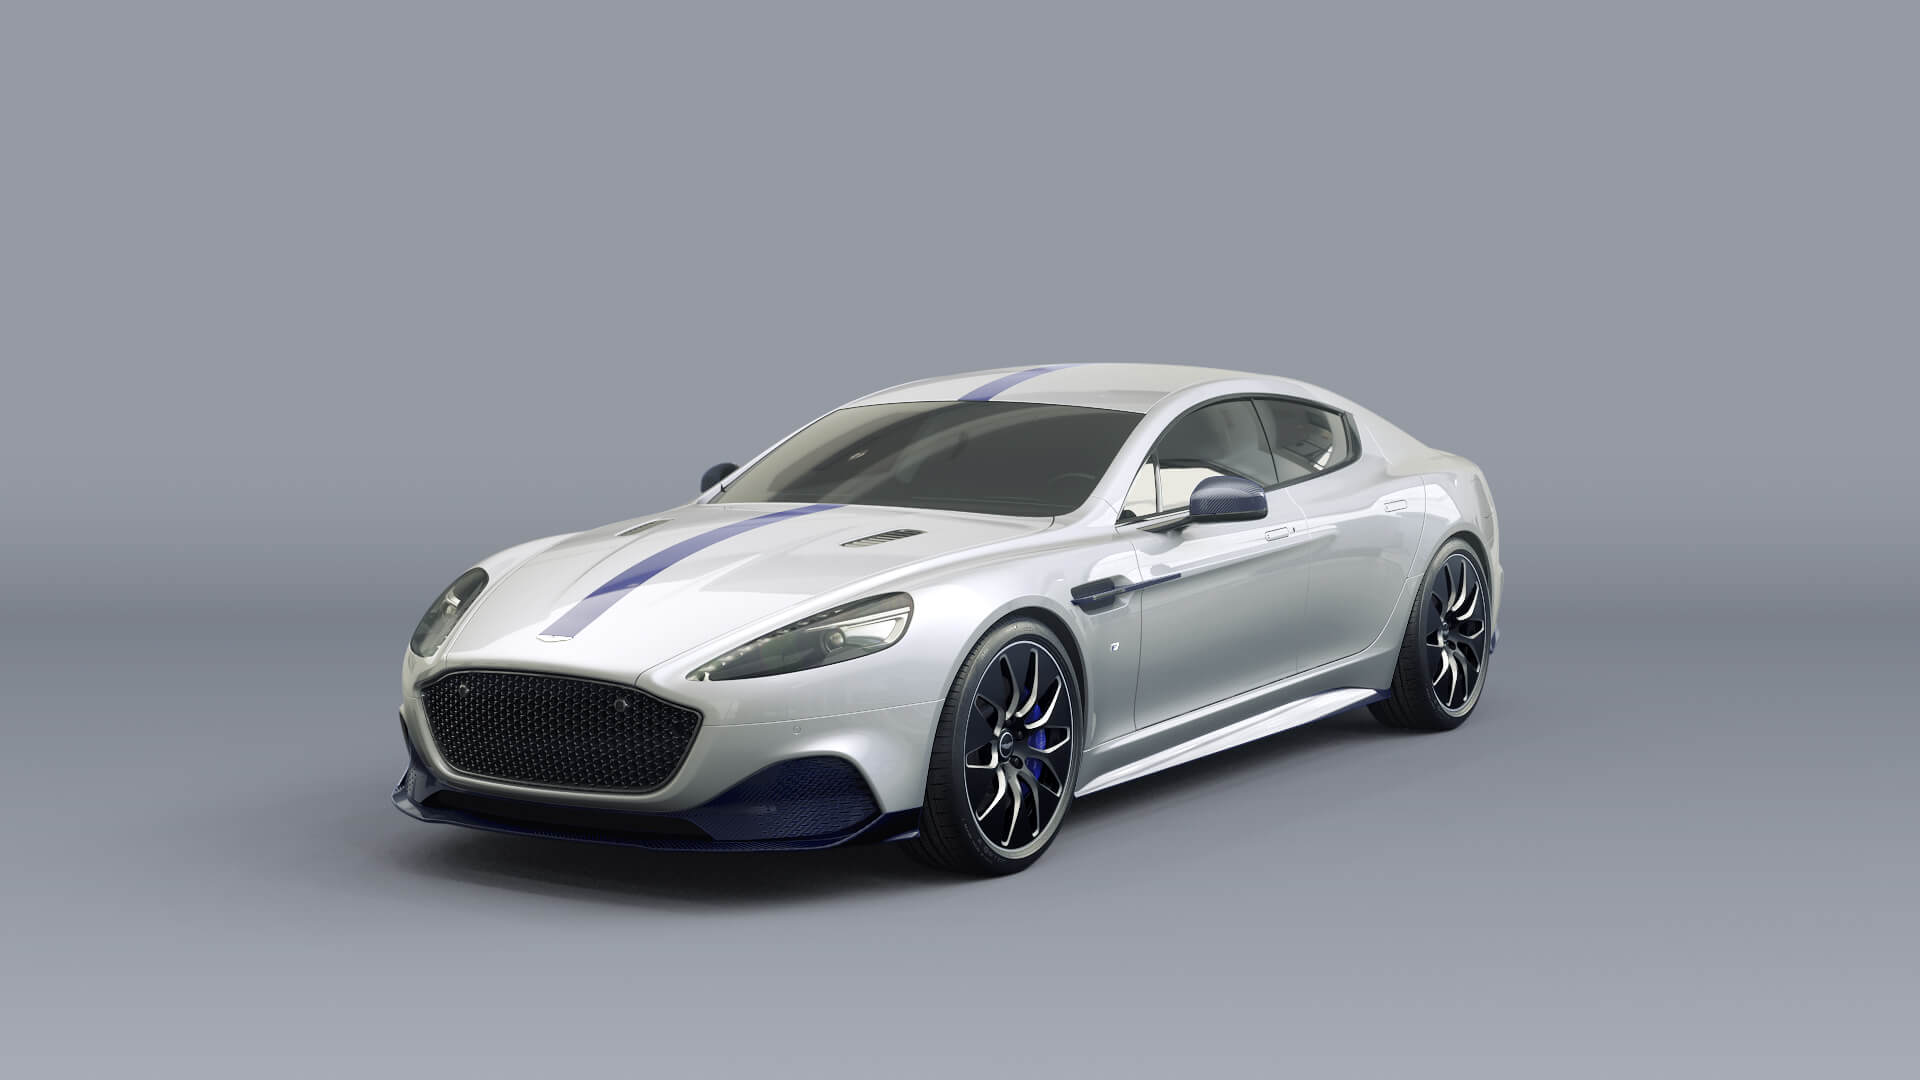 Rapide E - The first All-Electric Aston Martin | Aston